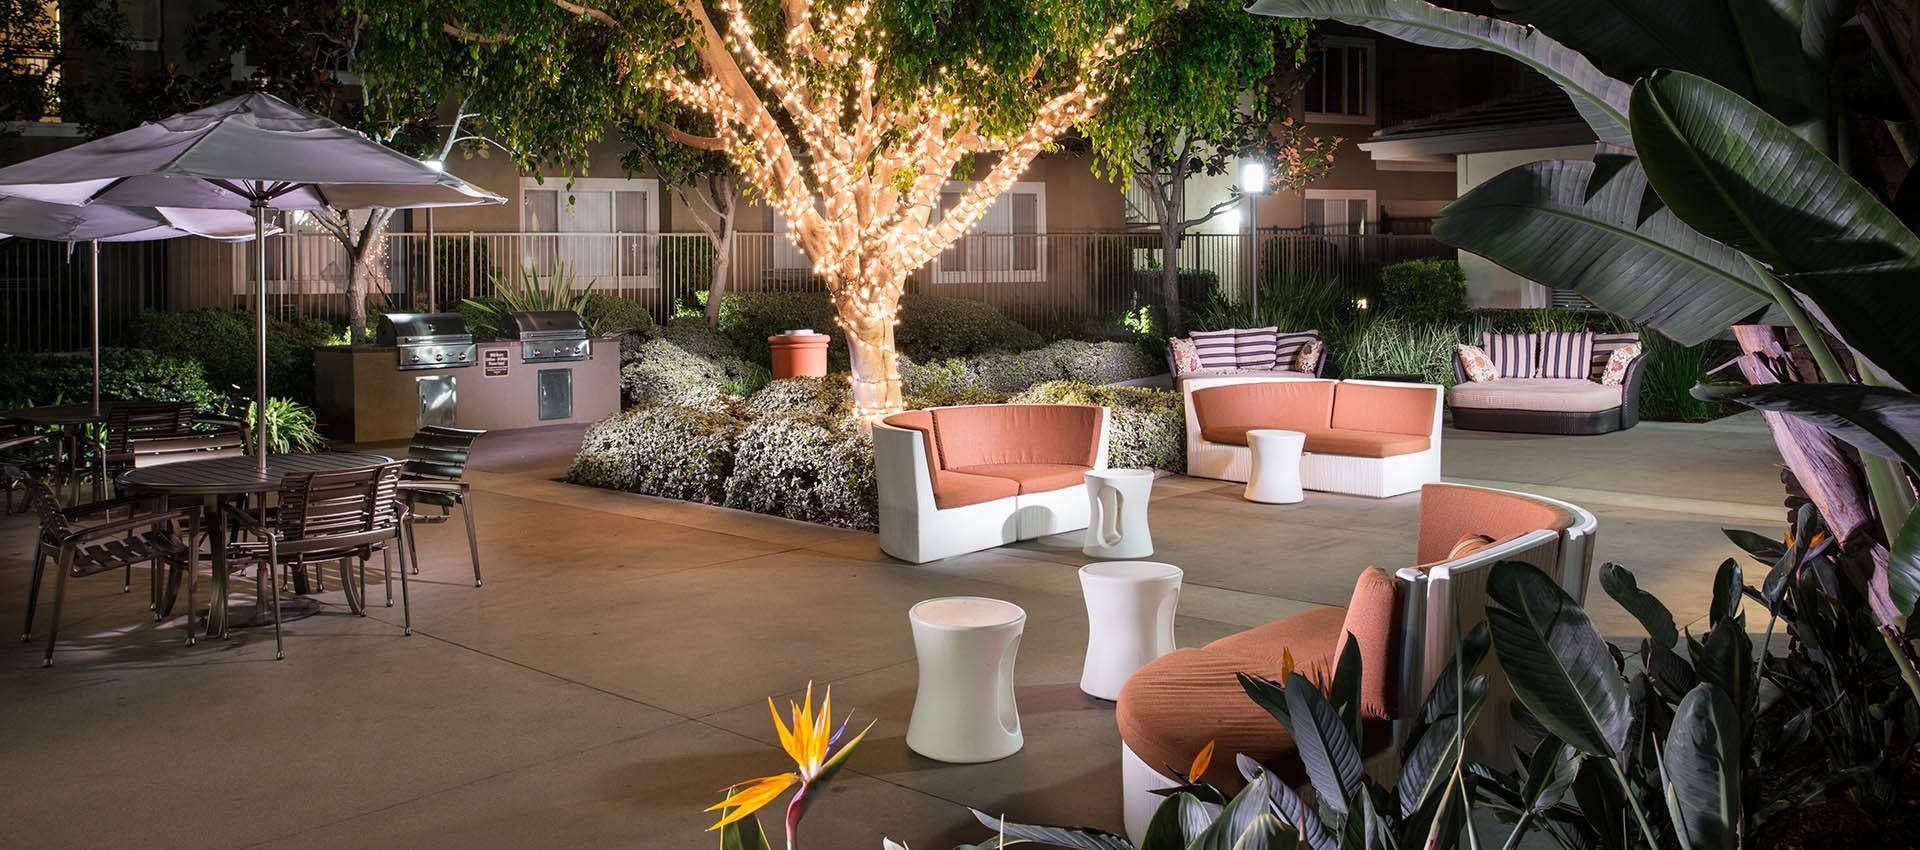 Courtyard With Bbq & Wifi Amenities Gallery